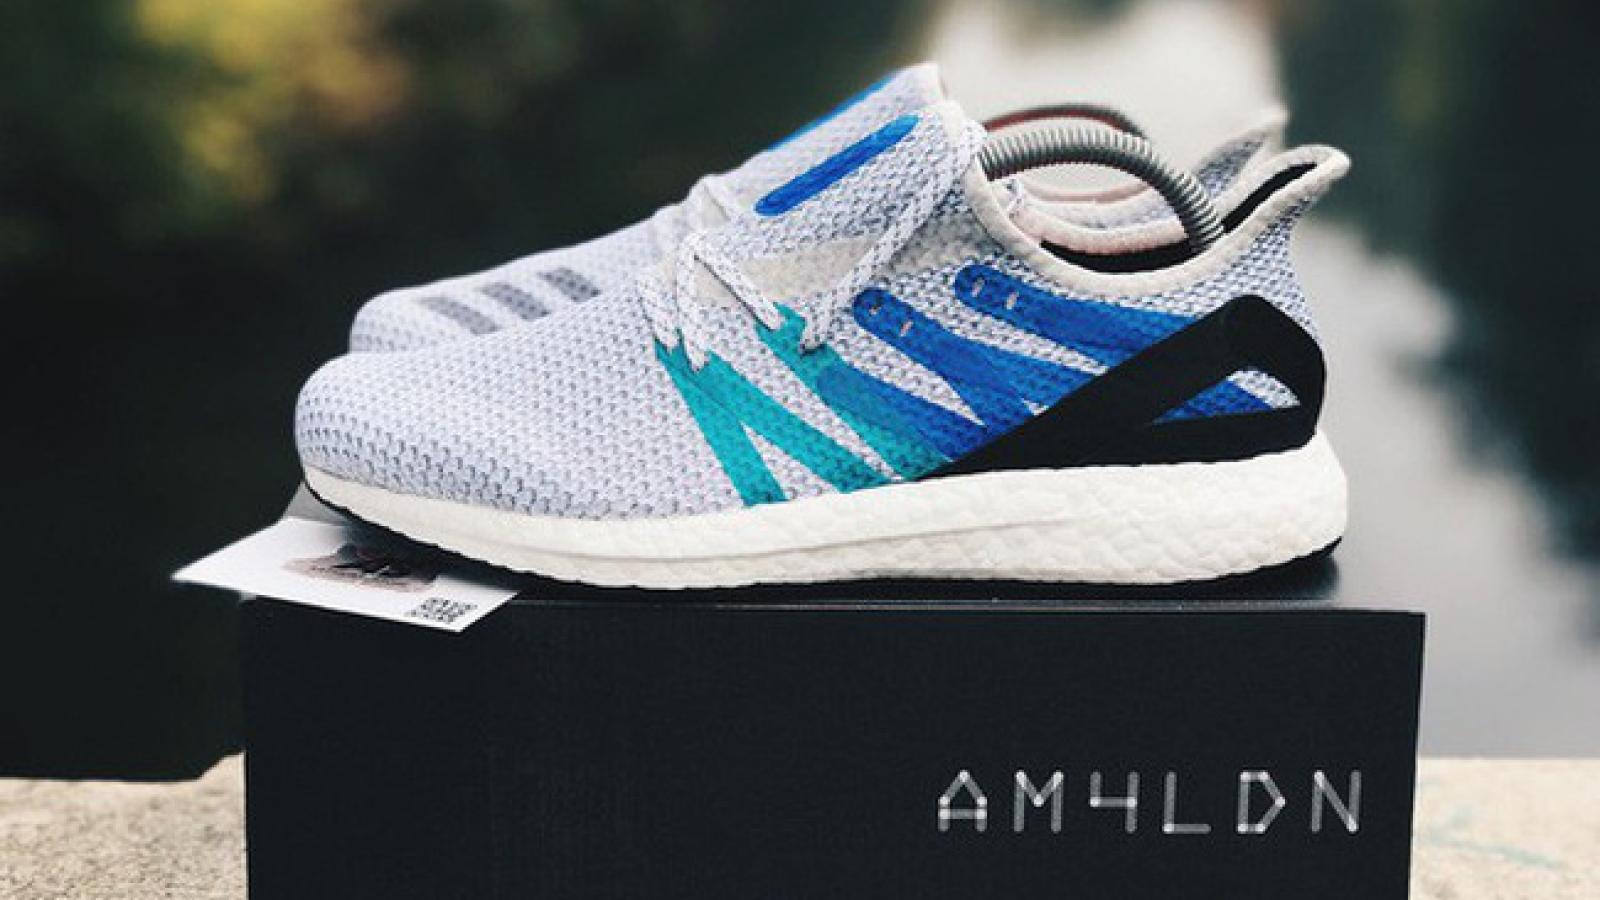 Adidas overseas SpeedFactories: how will it affect VN footwear industry?